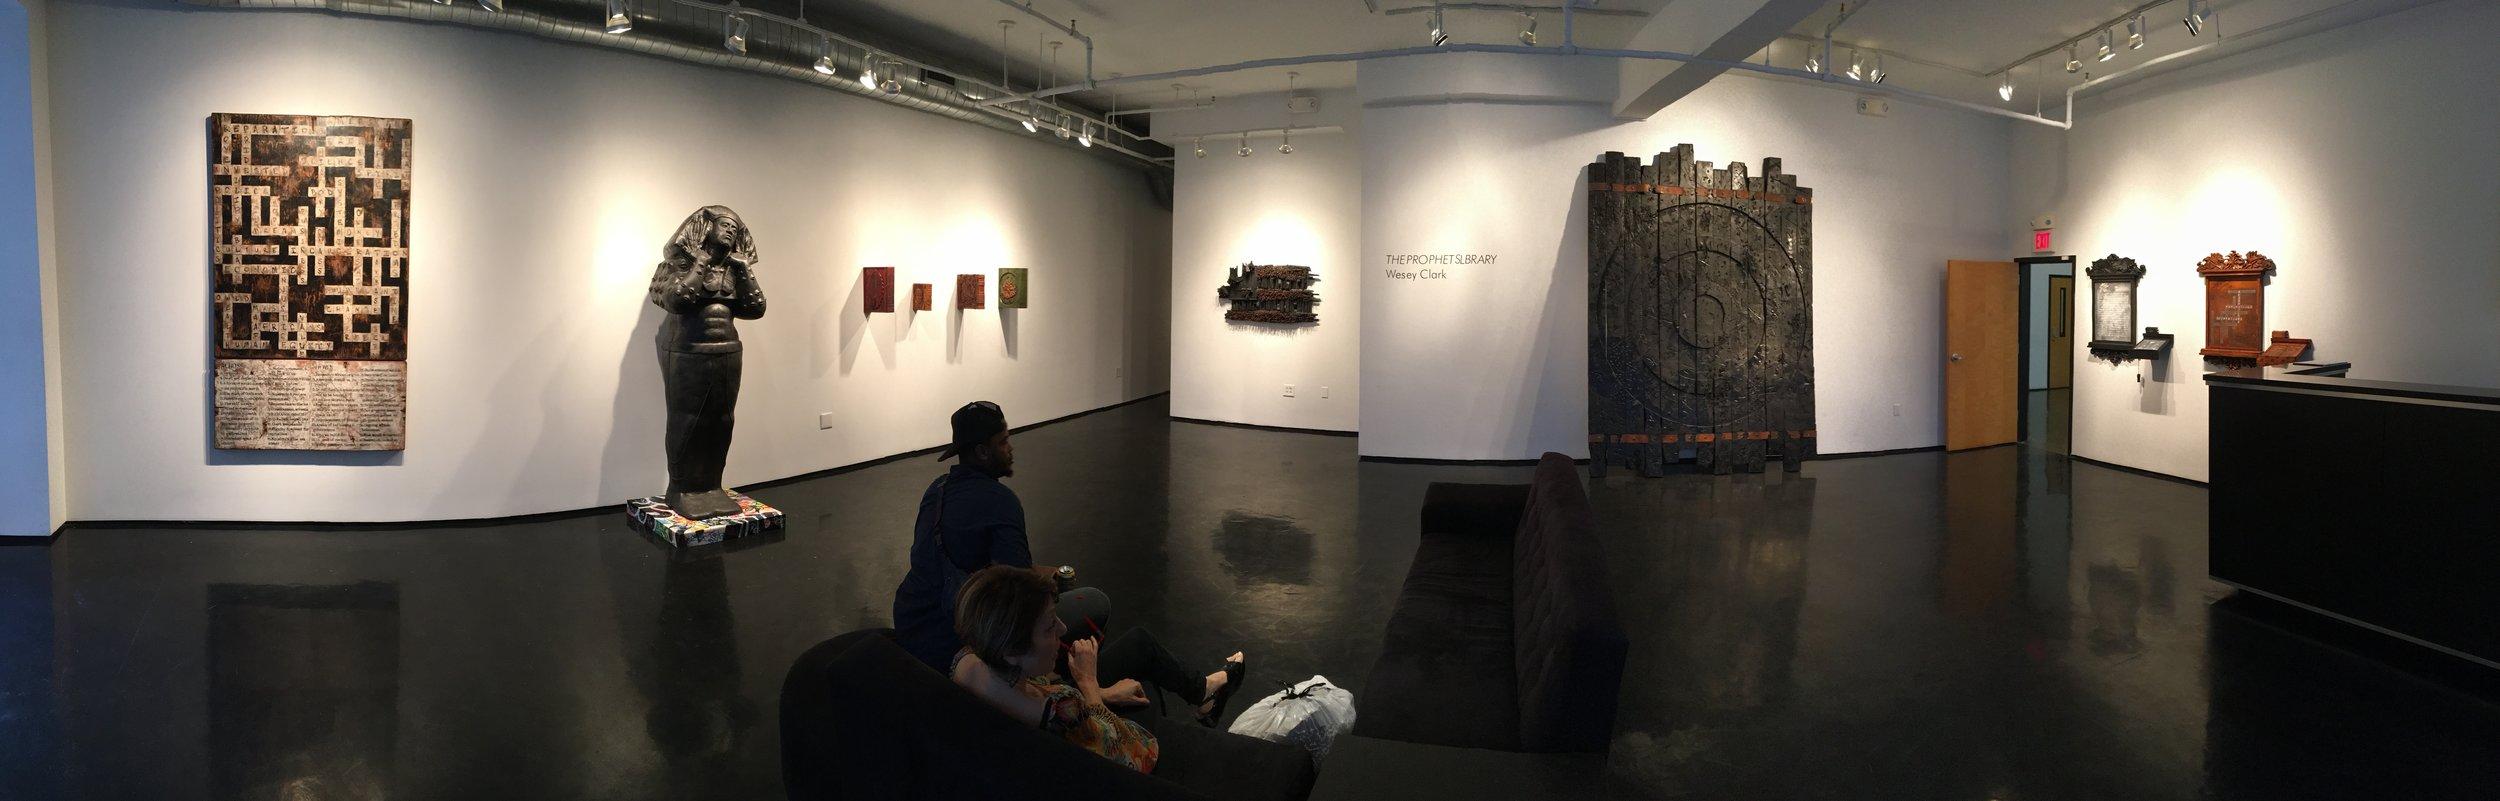 """The Prophet's Library"" @ Tinney Contemporary, Nashville, TN - 2017"